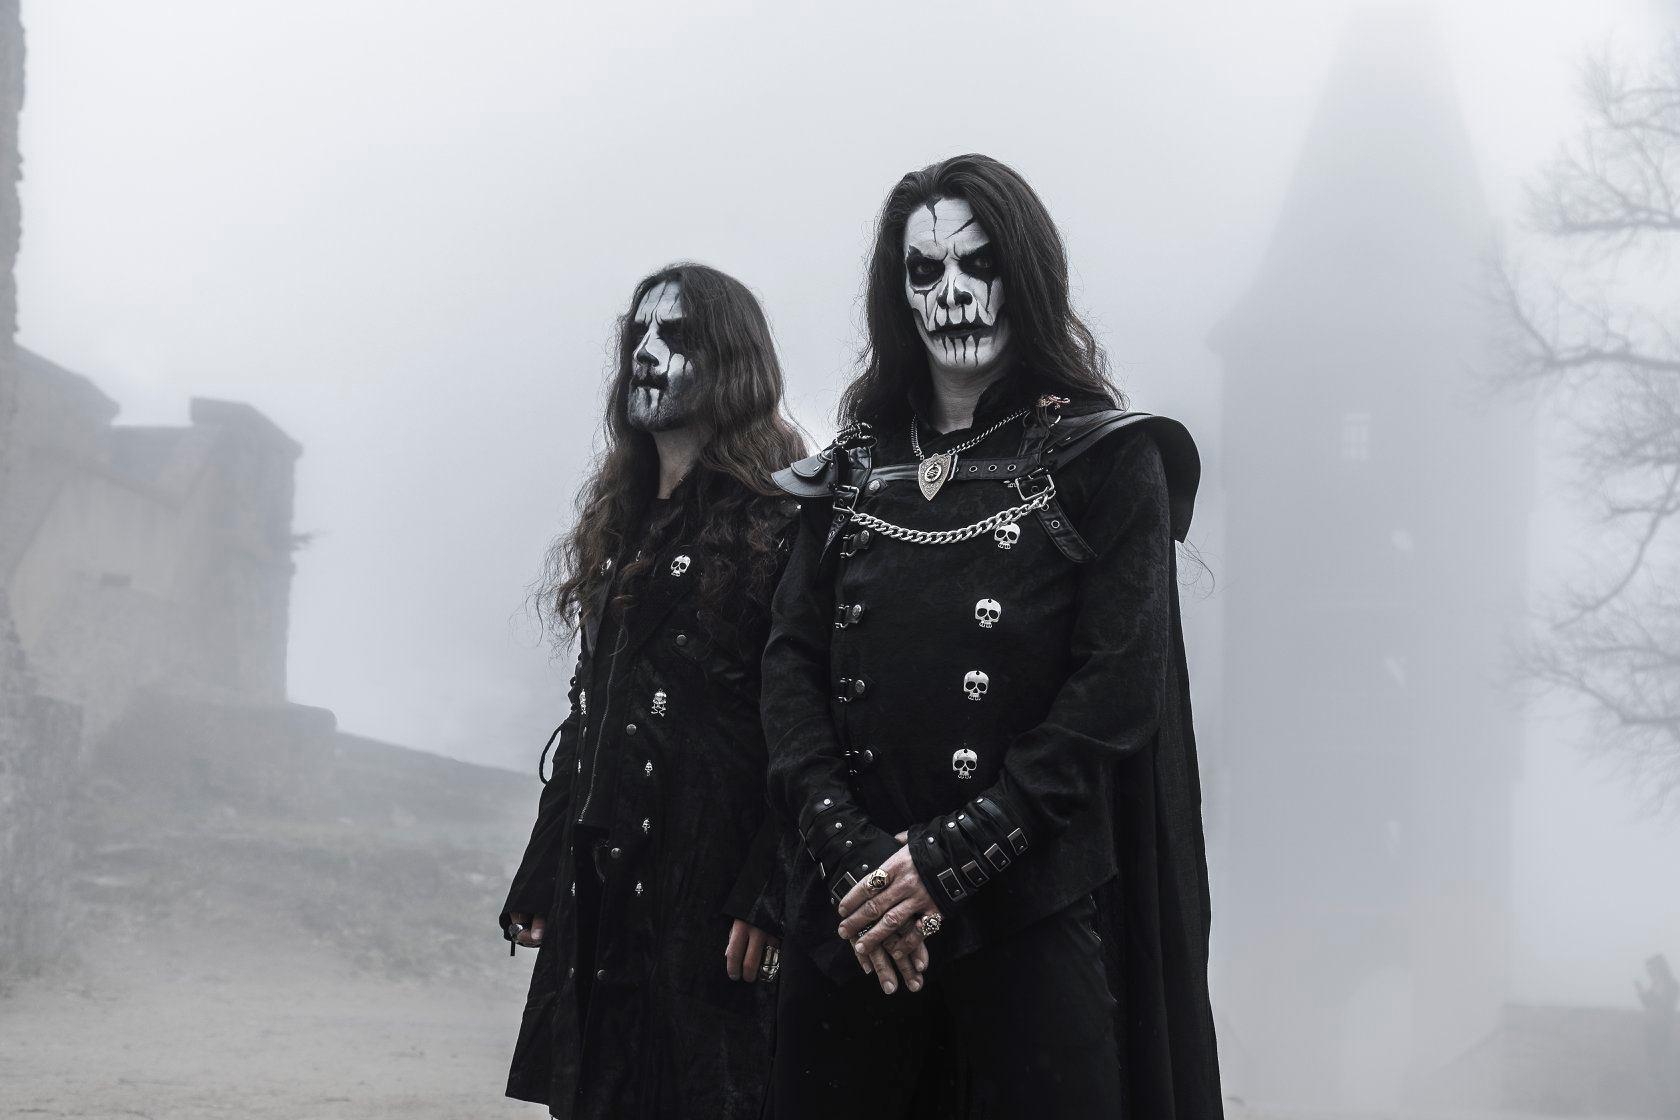 CARACH ANGREN Franckensteina Strataemontanus (2020) Black Metal Hollande  90584510